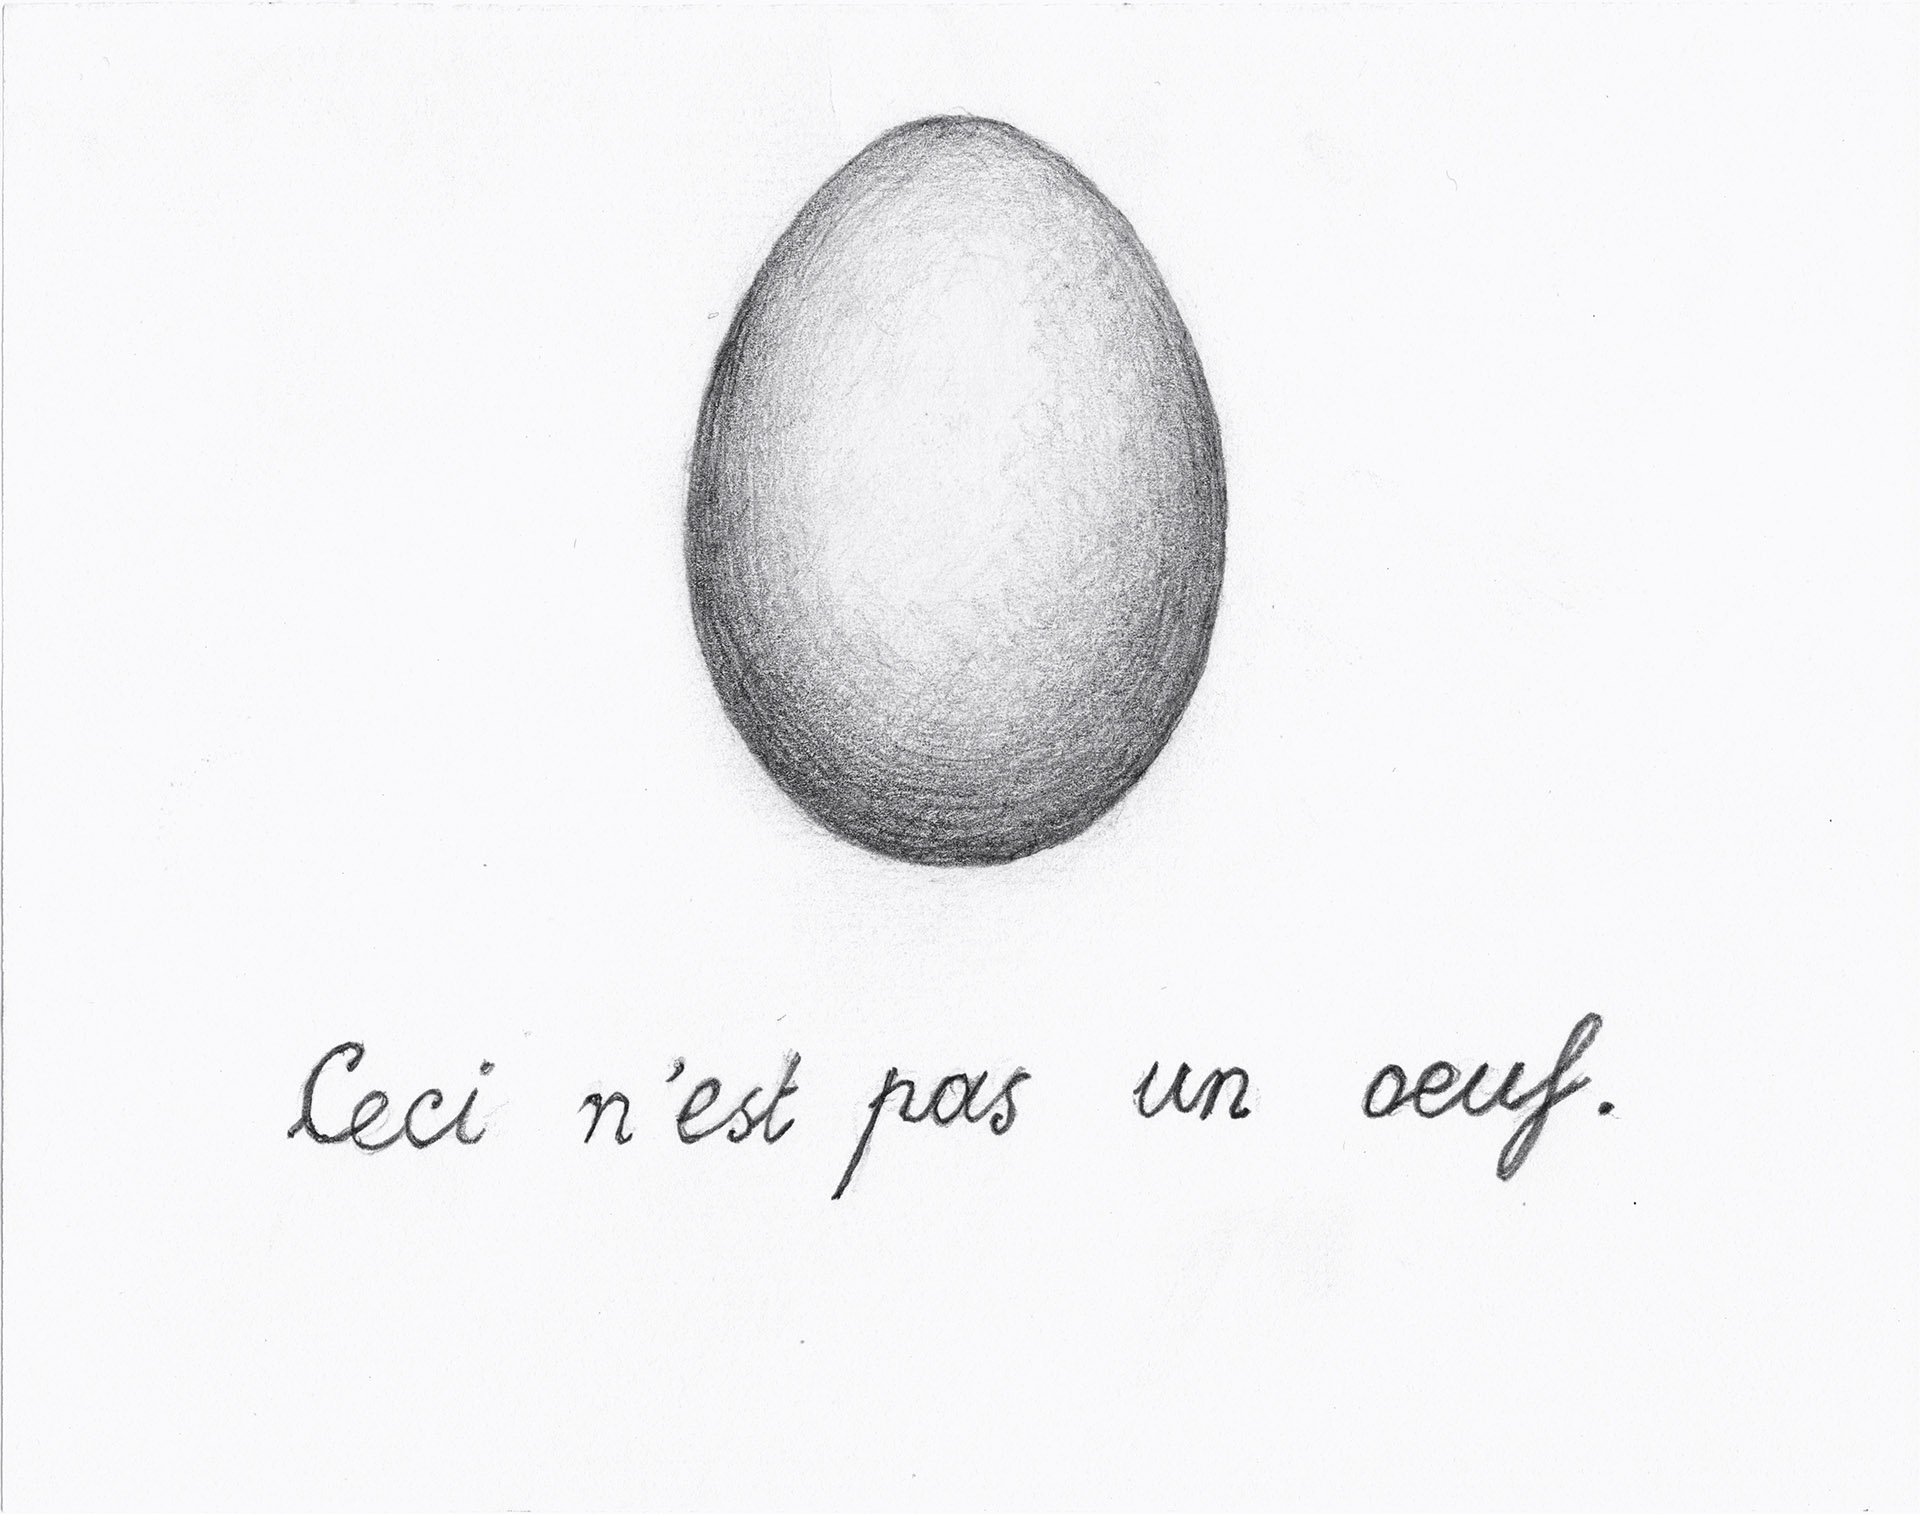 Egg as Ego